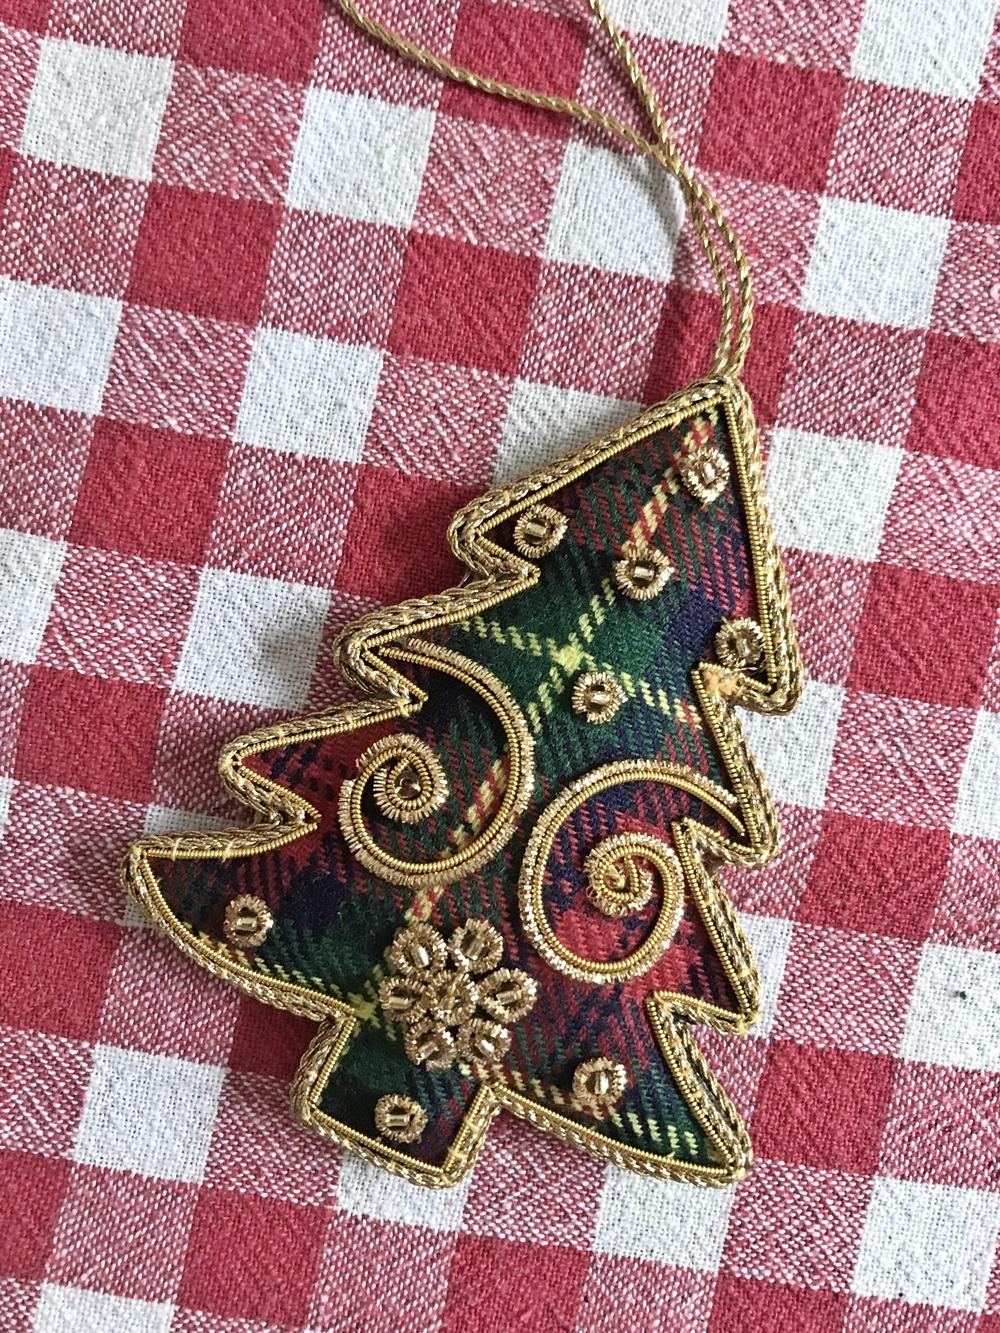 Decoration de Noel ecosse tartan sapin